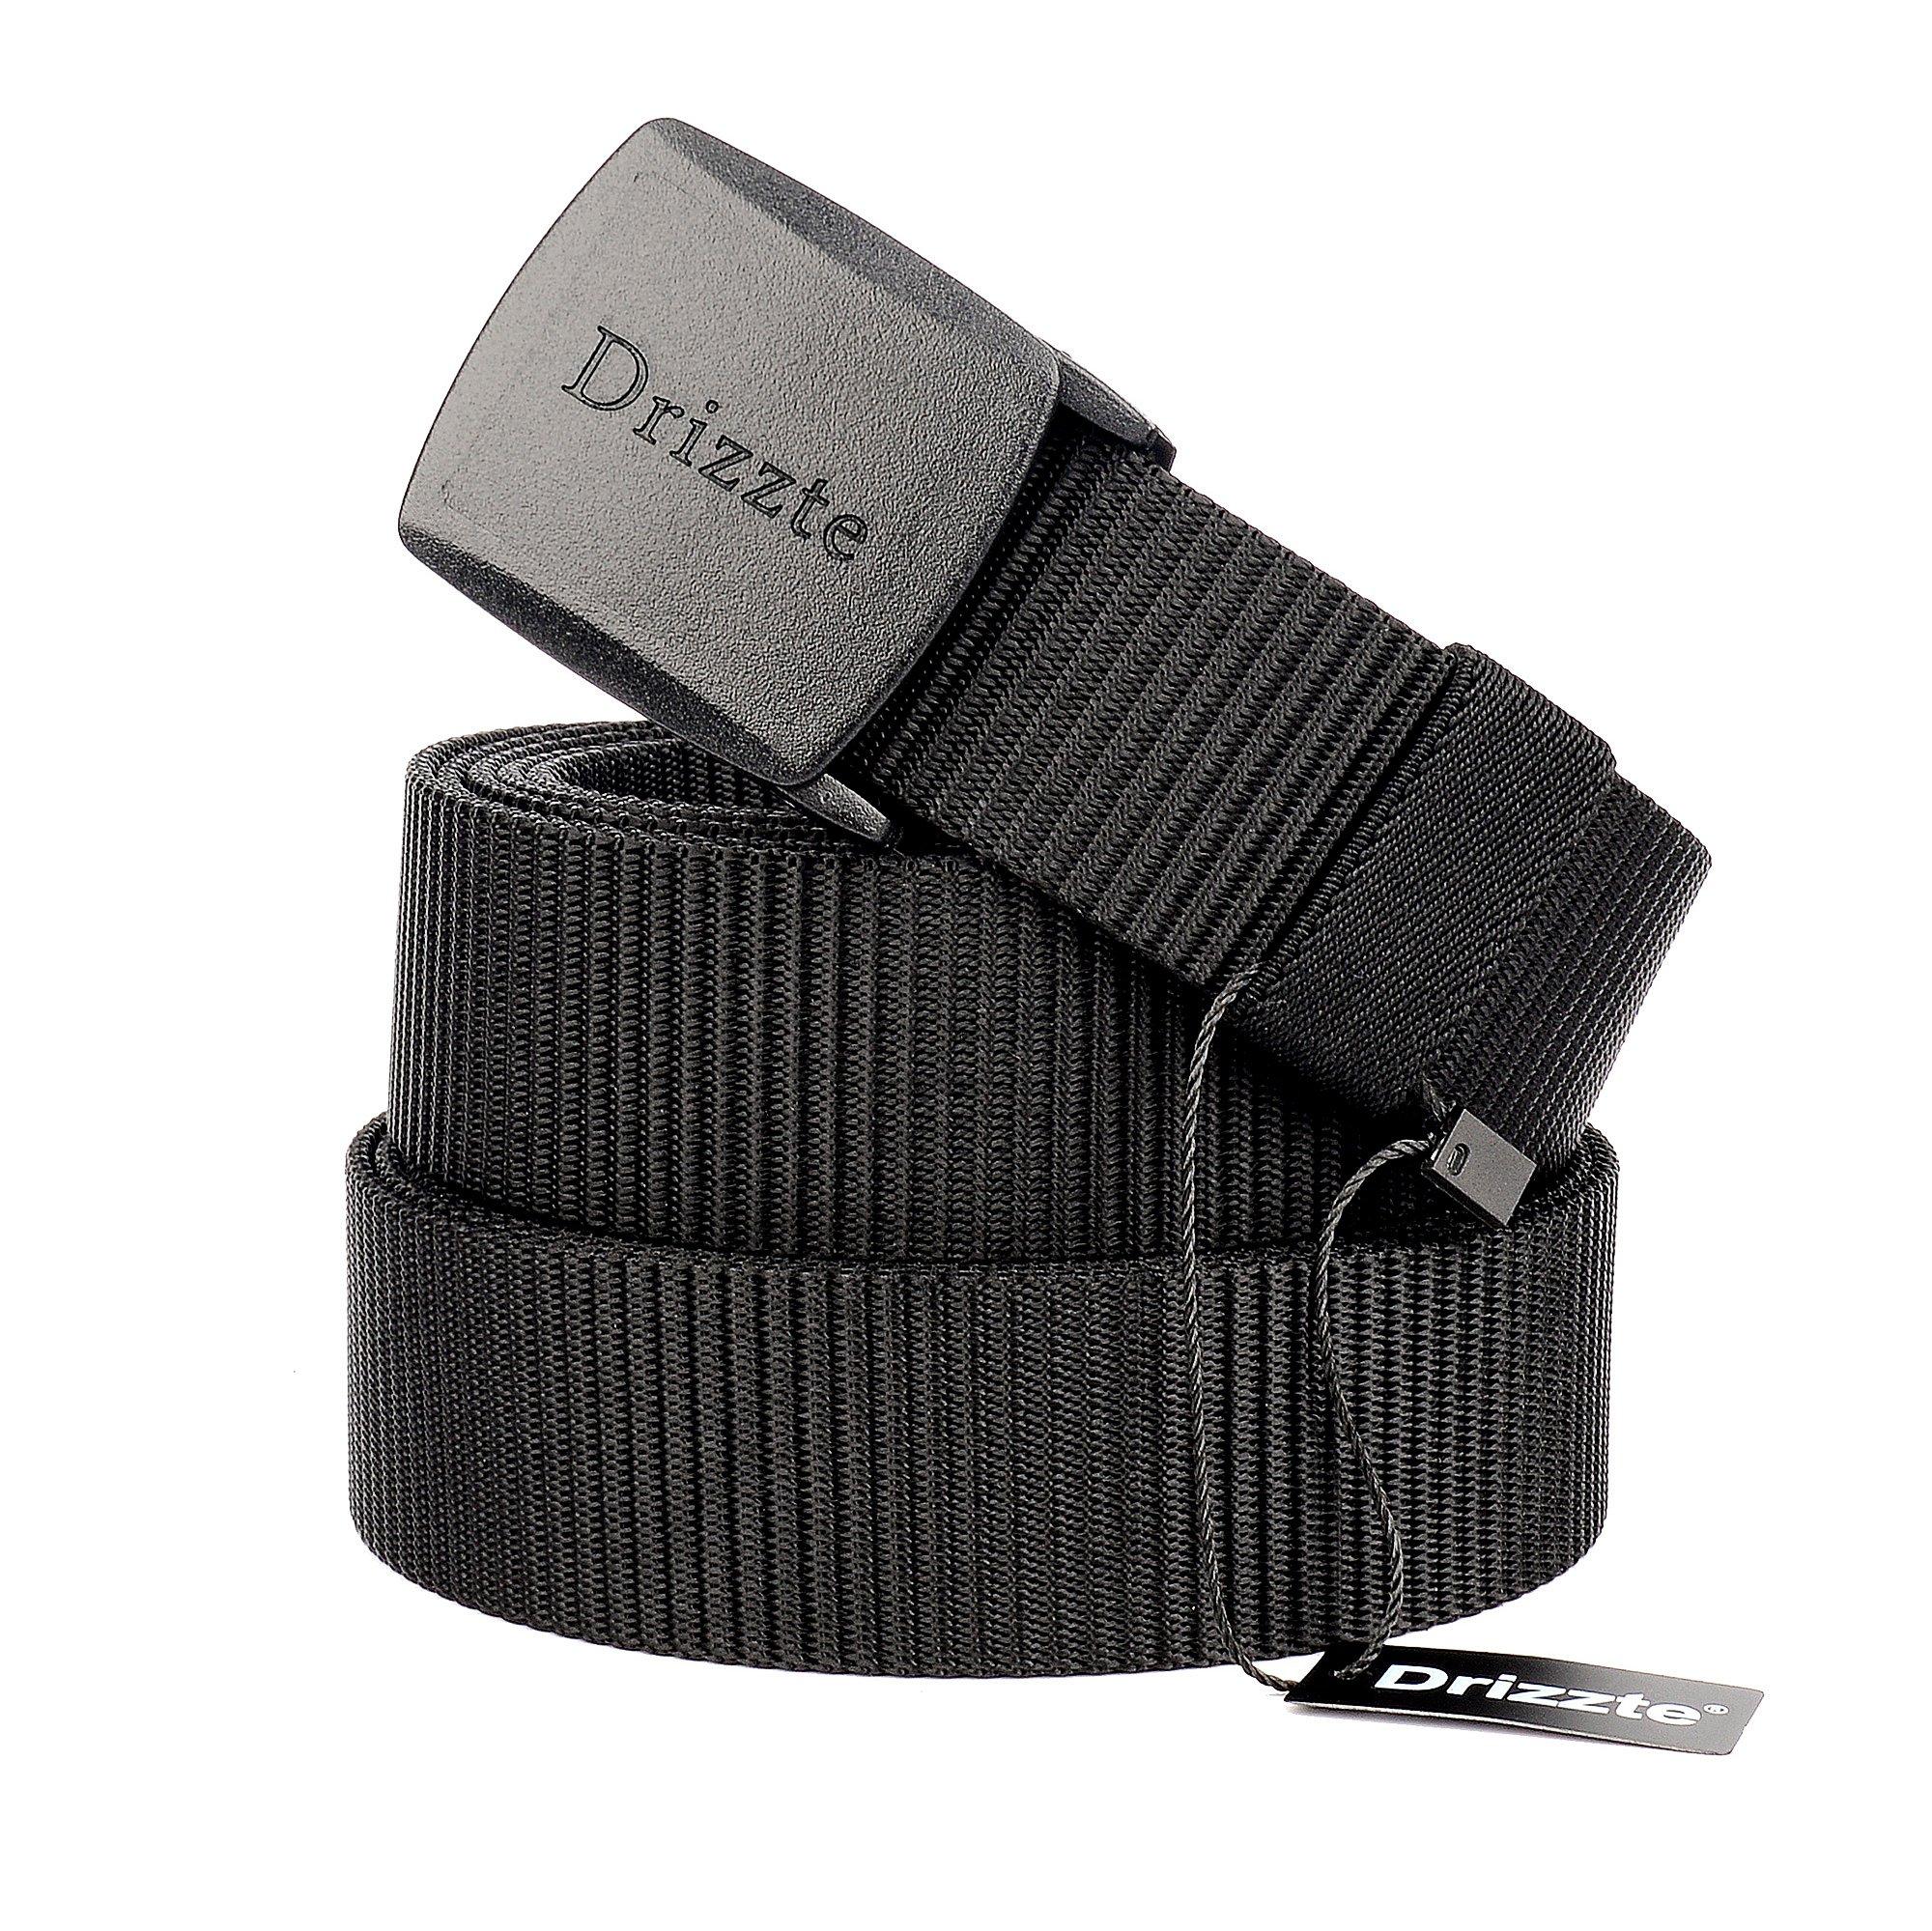 Drizzte 55'' Plus Size Long Men's Military Duty Web Nylon Belt Plastic Buckle Black